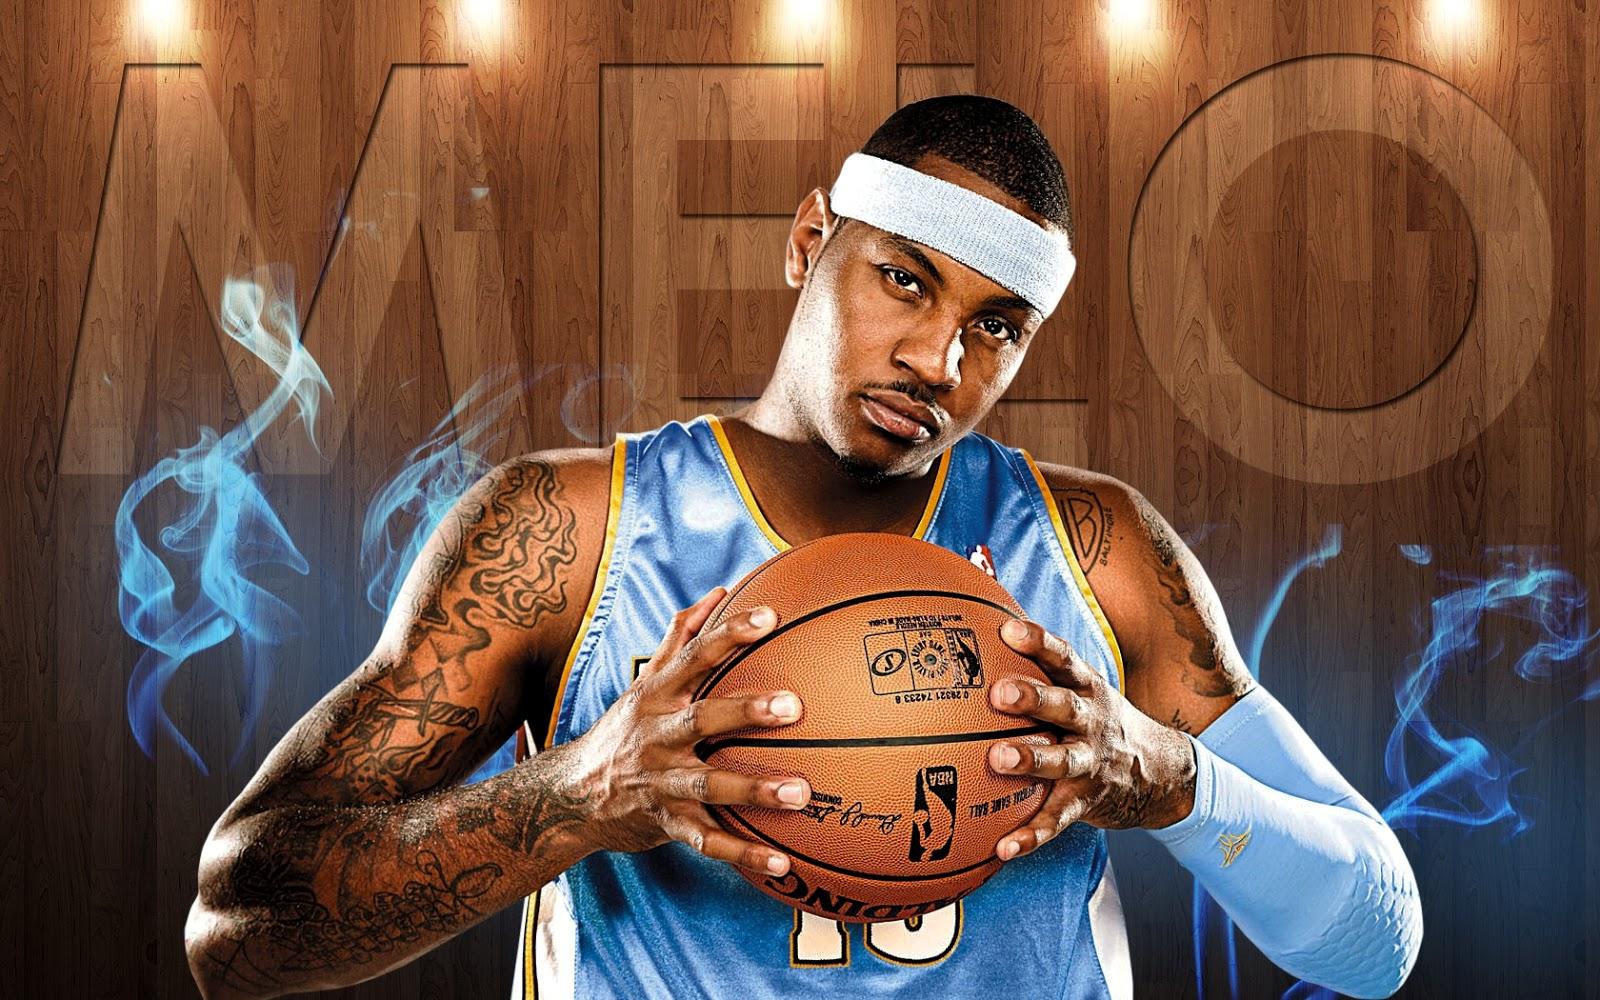 Carmelo Anthony Wallpapers HD - WallpaperSafari